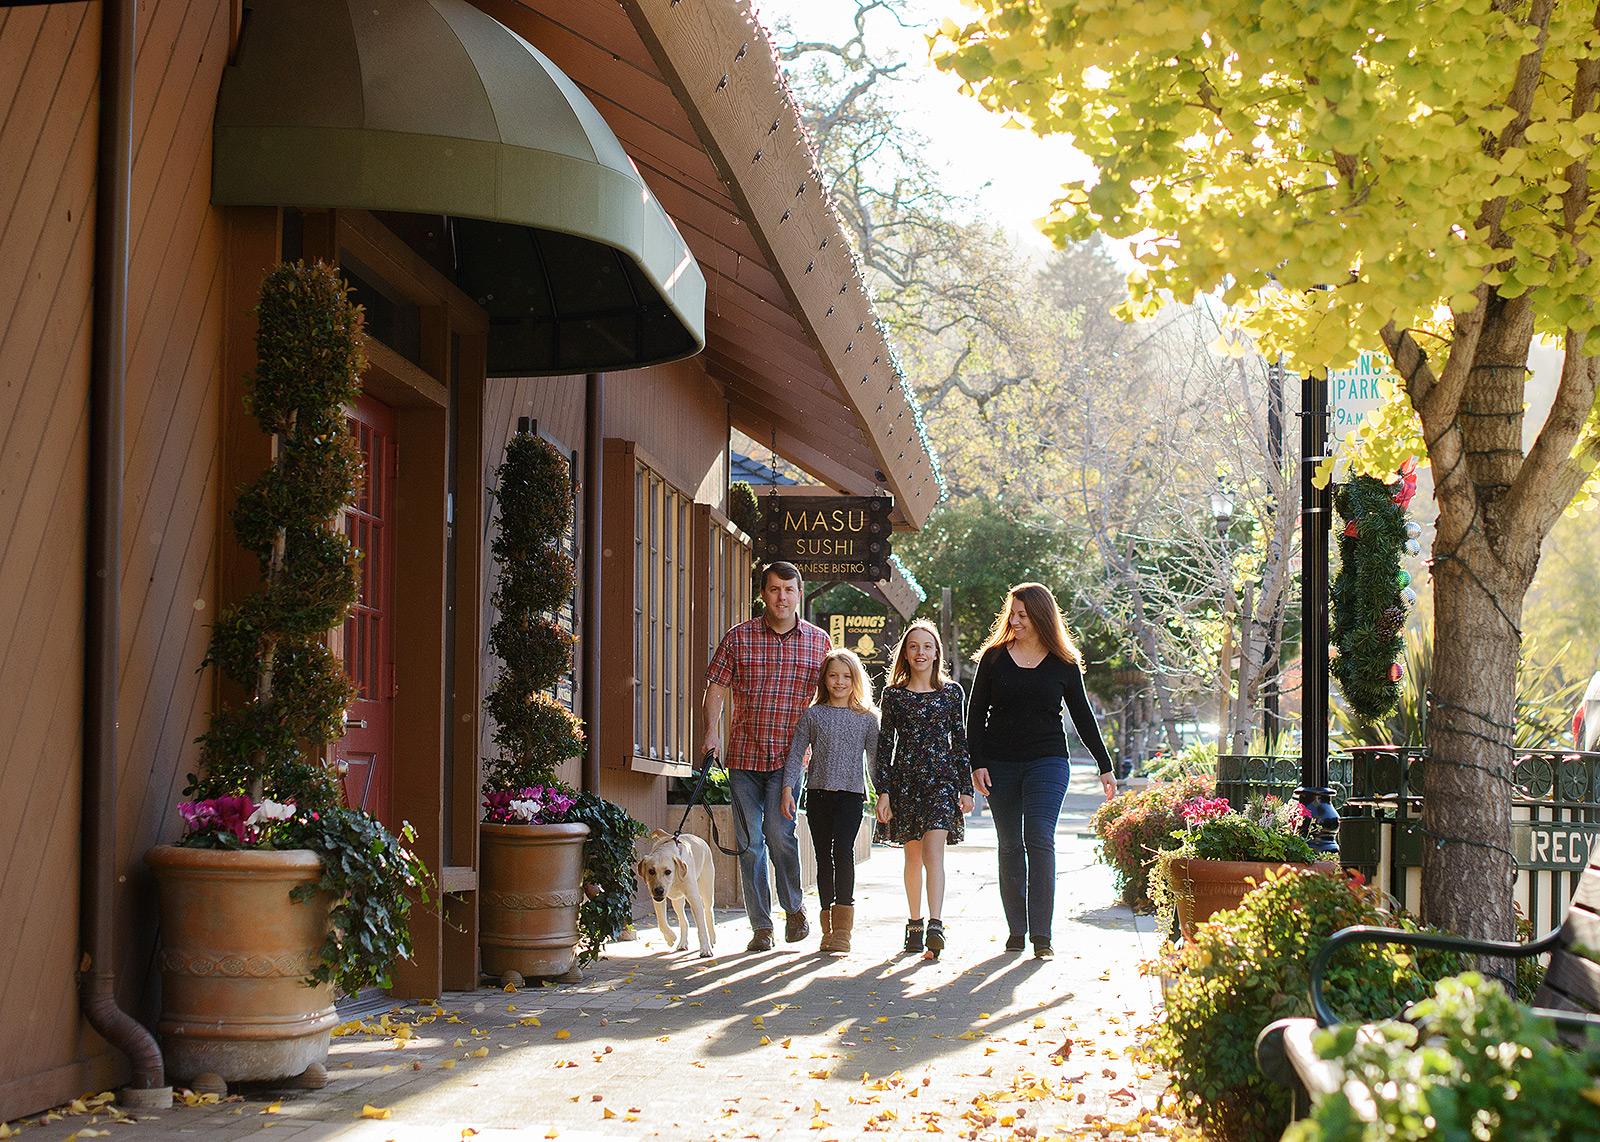 Family walking through Saratoga street in the fall